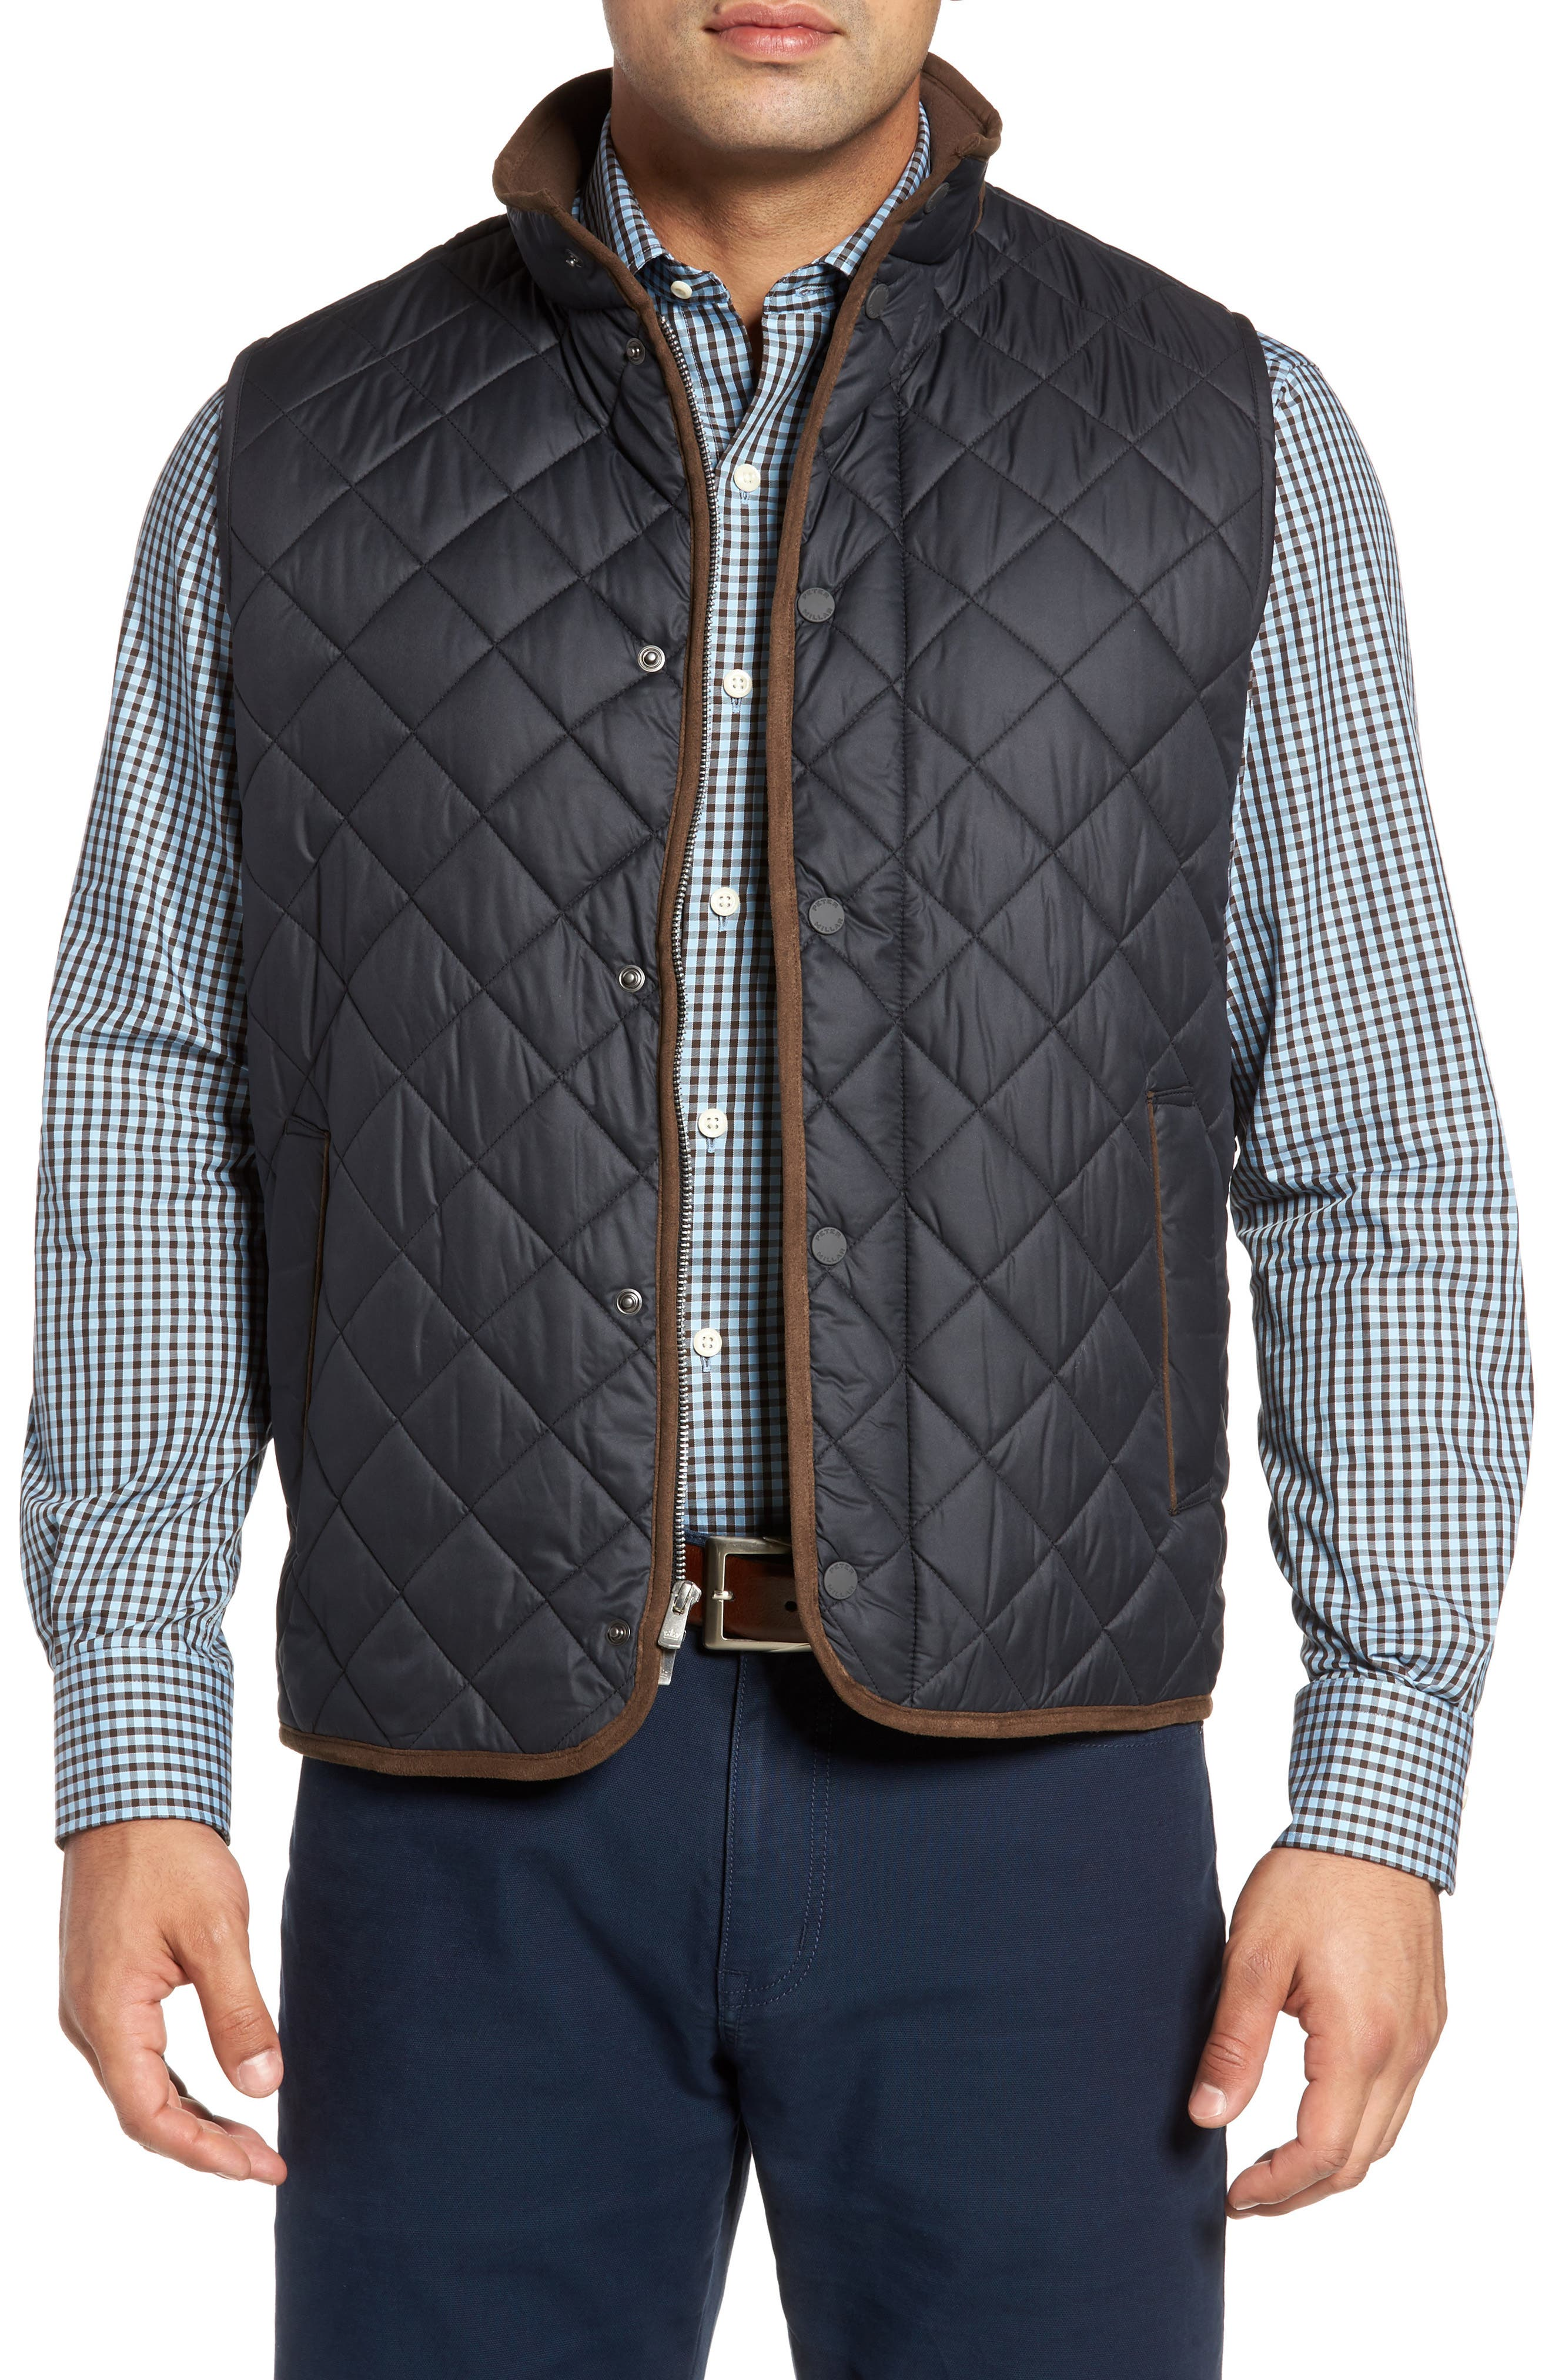 Alternate Image 1 Selected - Peter Millar Essex Quilted Vest